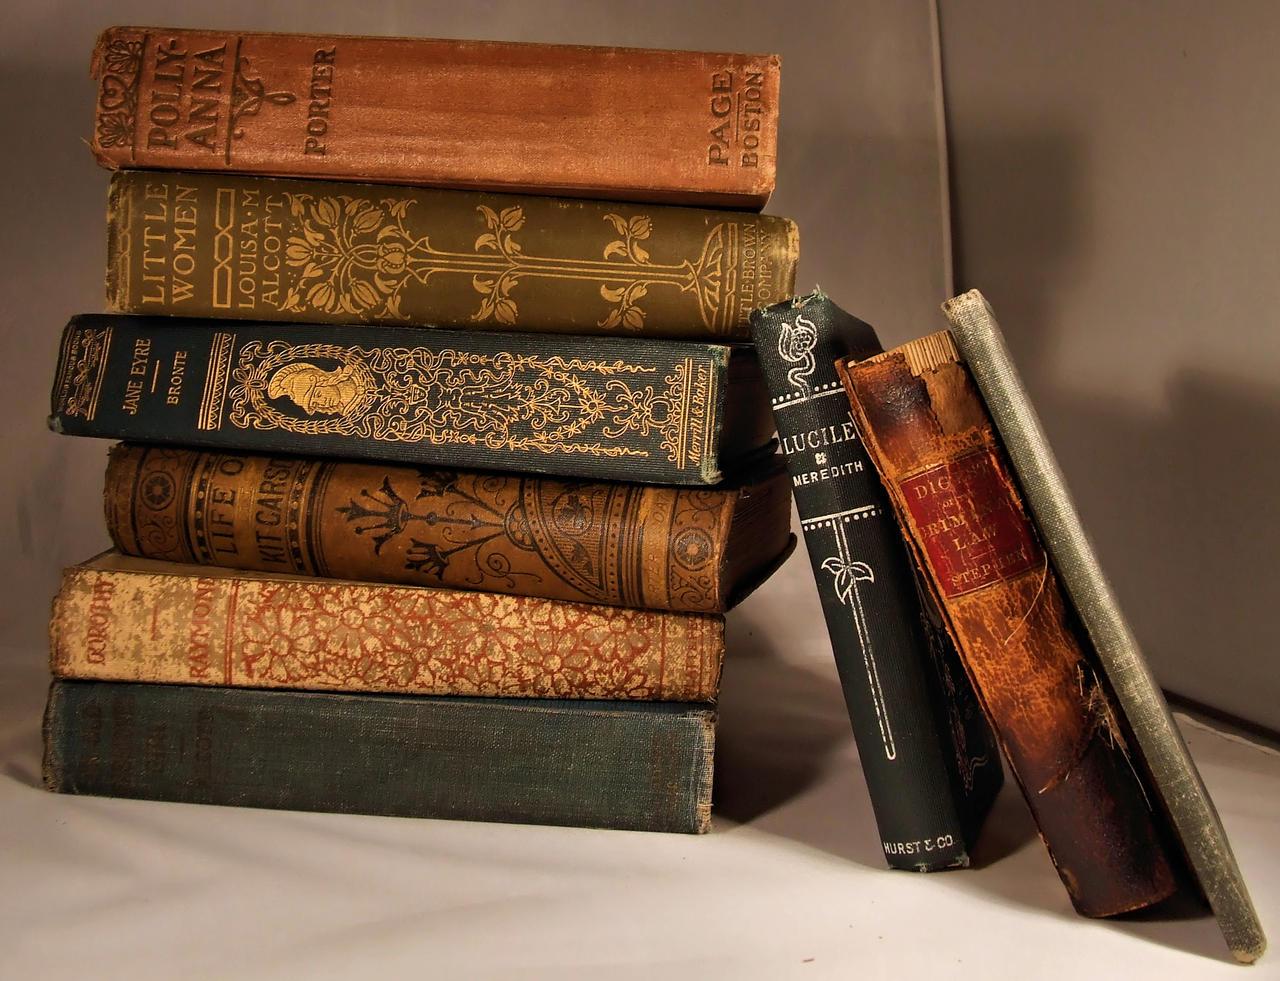 Antique Books 1 by DamselStock